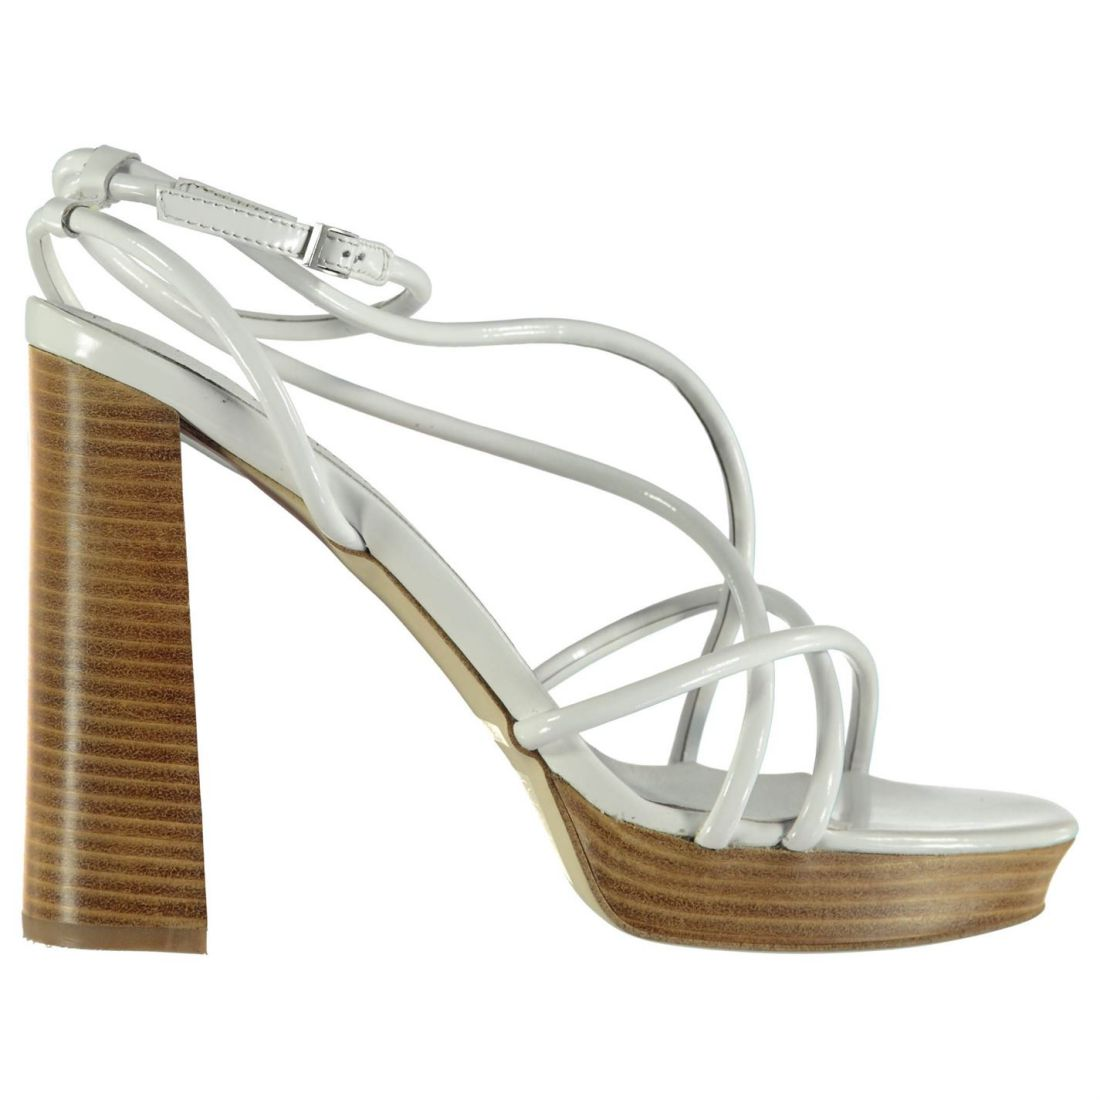 e2914bbf41b Jeffrey Campbell Womens Regaliz Heeled Sandals Buckle Ankle ...